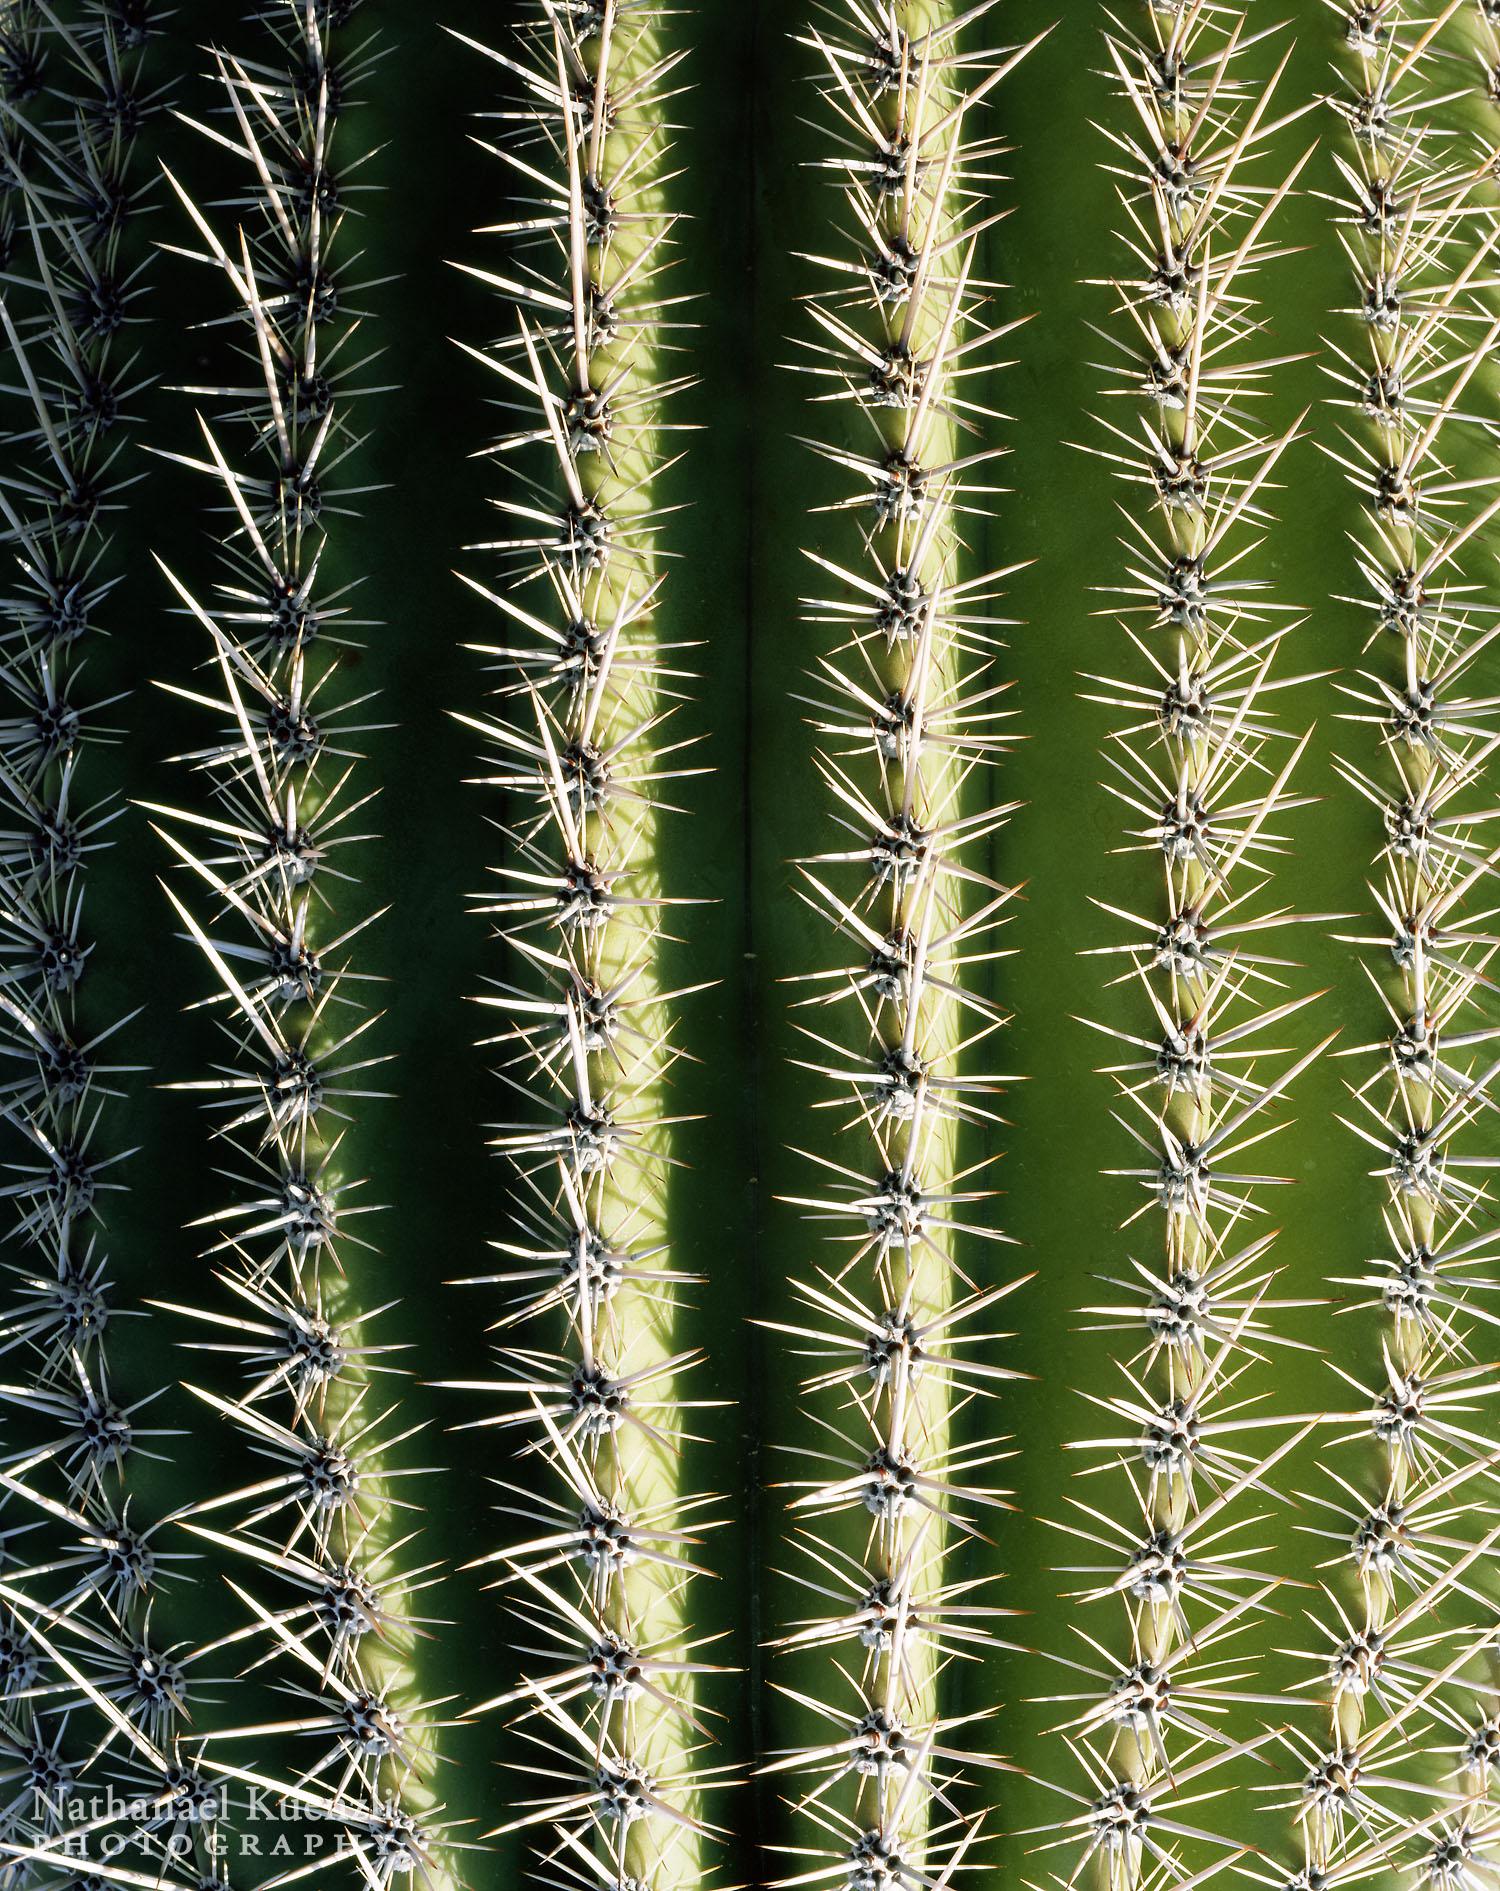 Saguaro Detail, Saguaro National Park, Arizona, March 2008